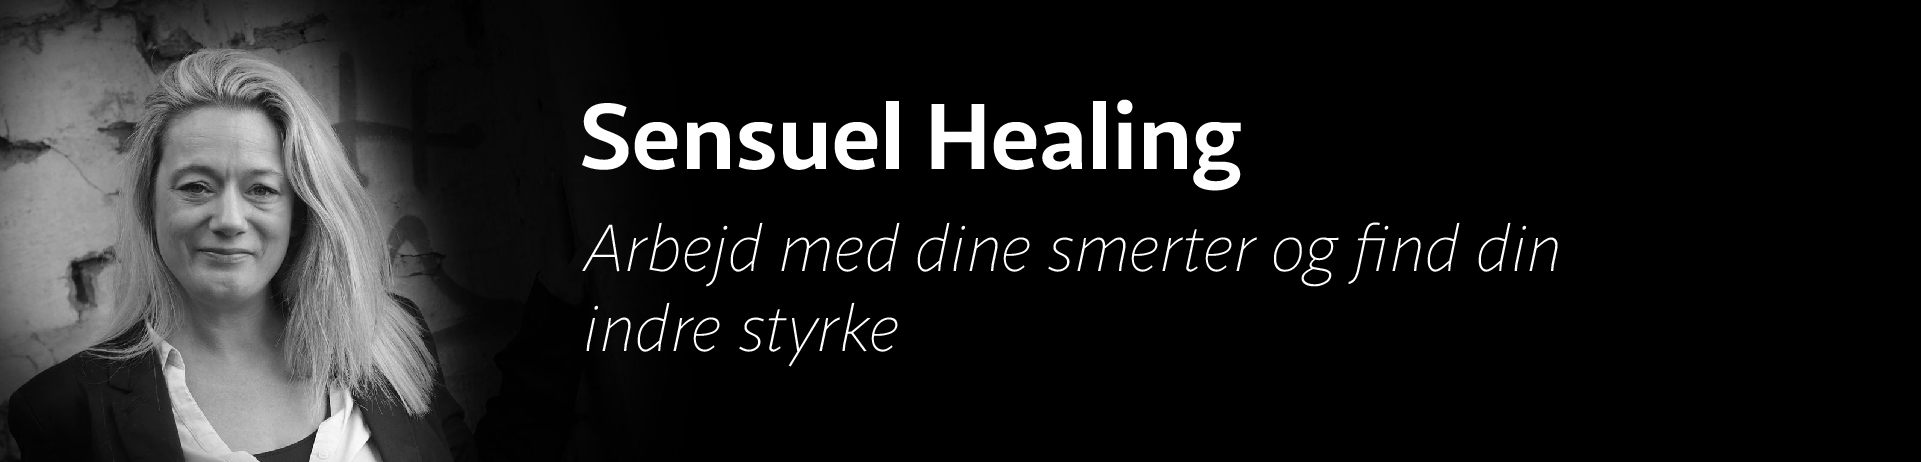 SensuelHealing-PK_1